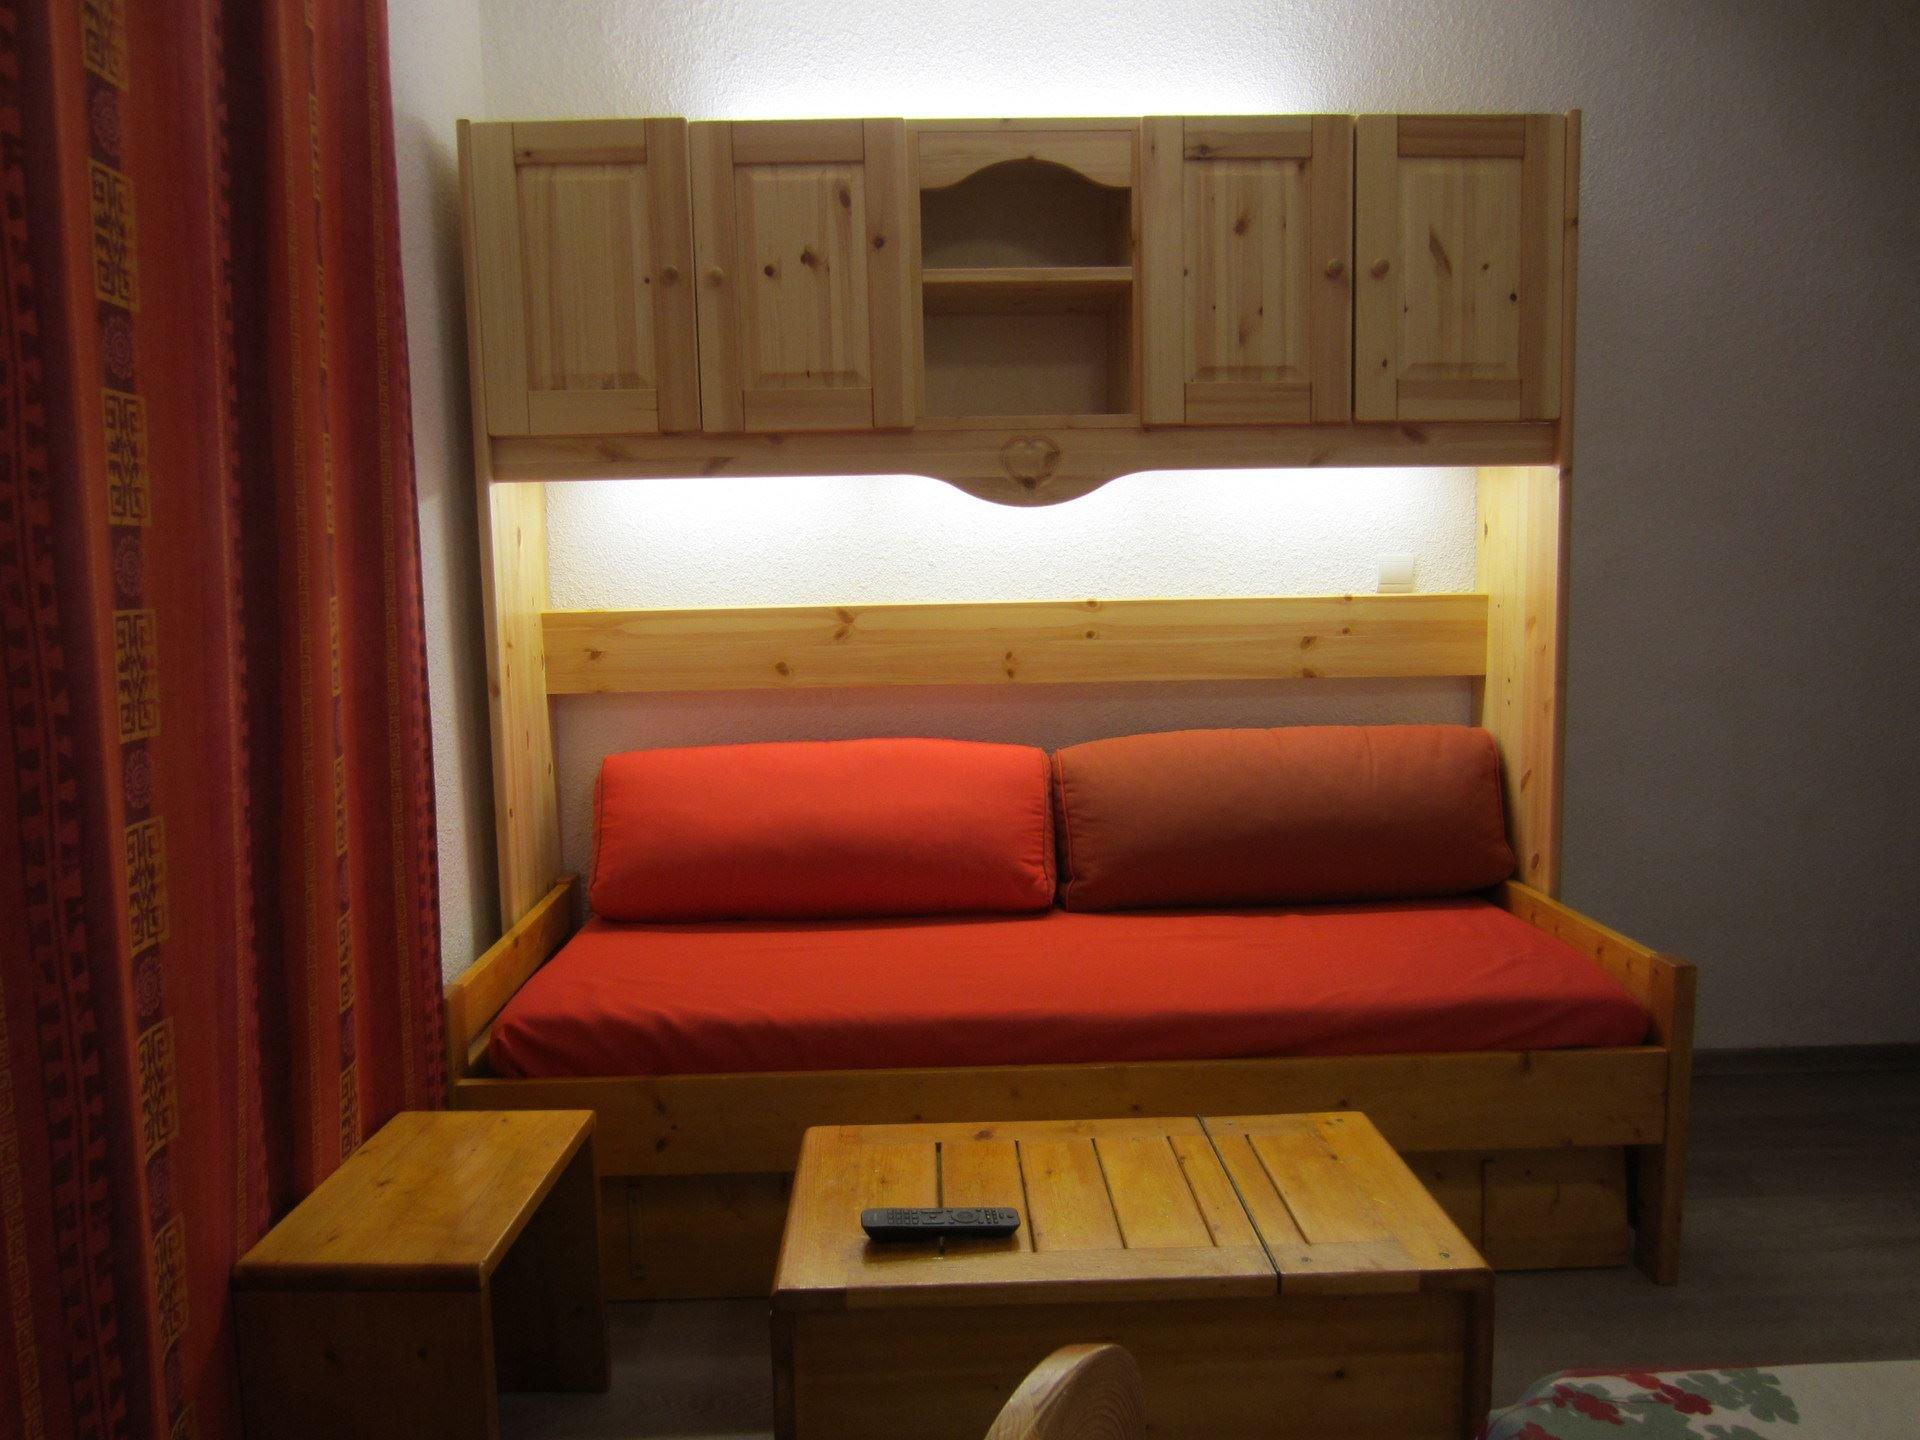 Studio cabine 4 Pers skis aux pieds / SORBIER 224